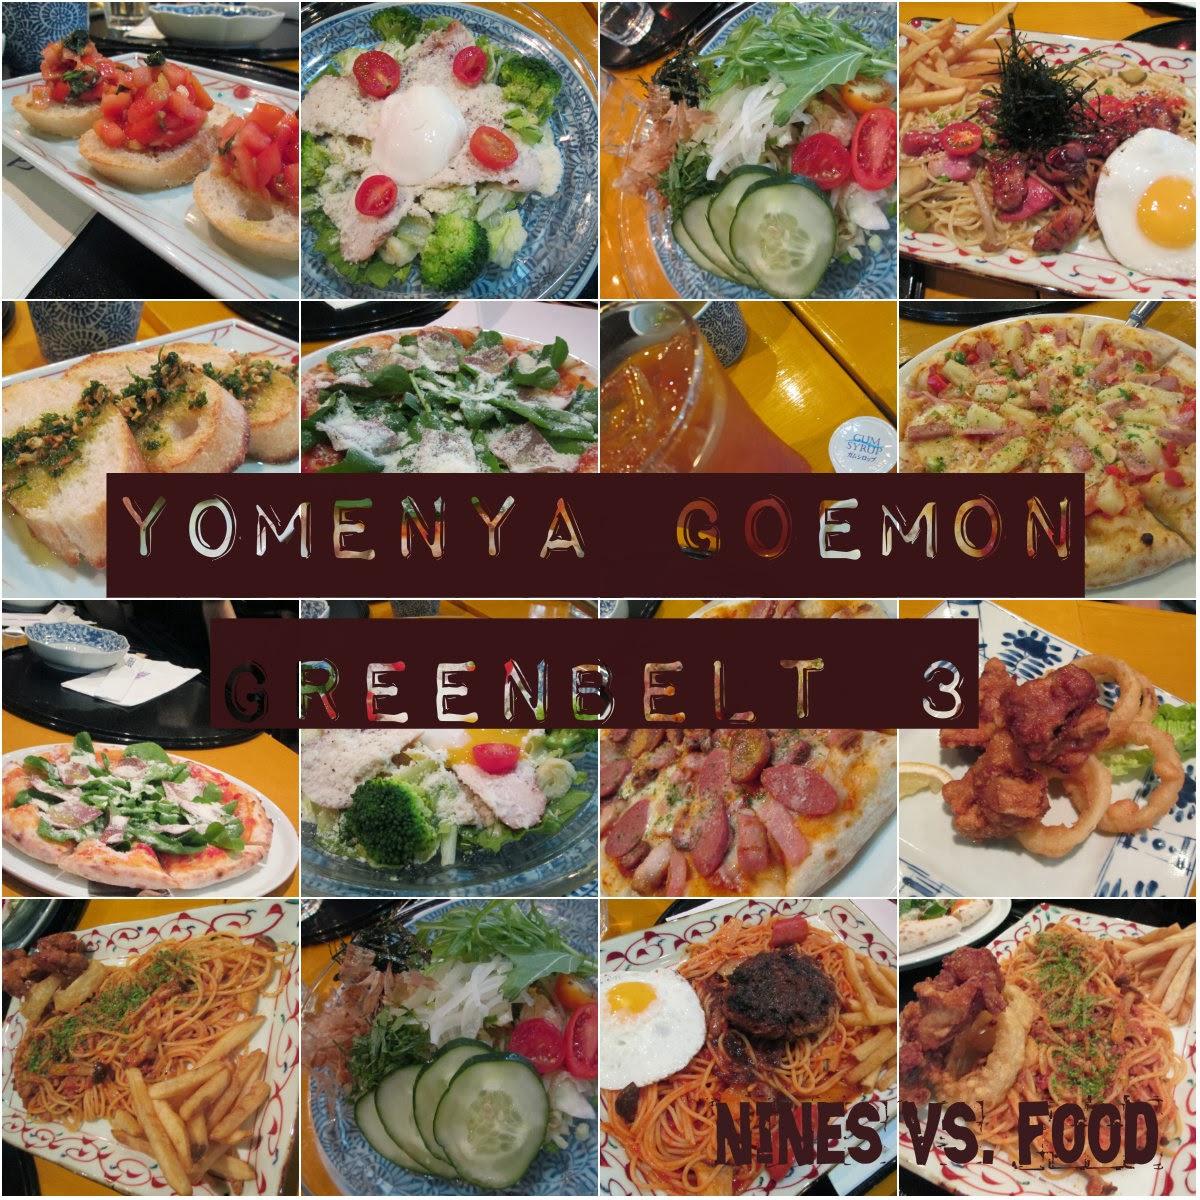 Nines vs. Food - Yomenya Goemon Greenbelt 3 - 1.jpg